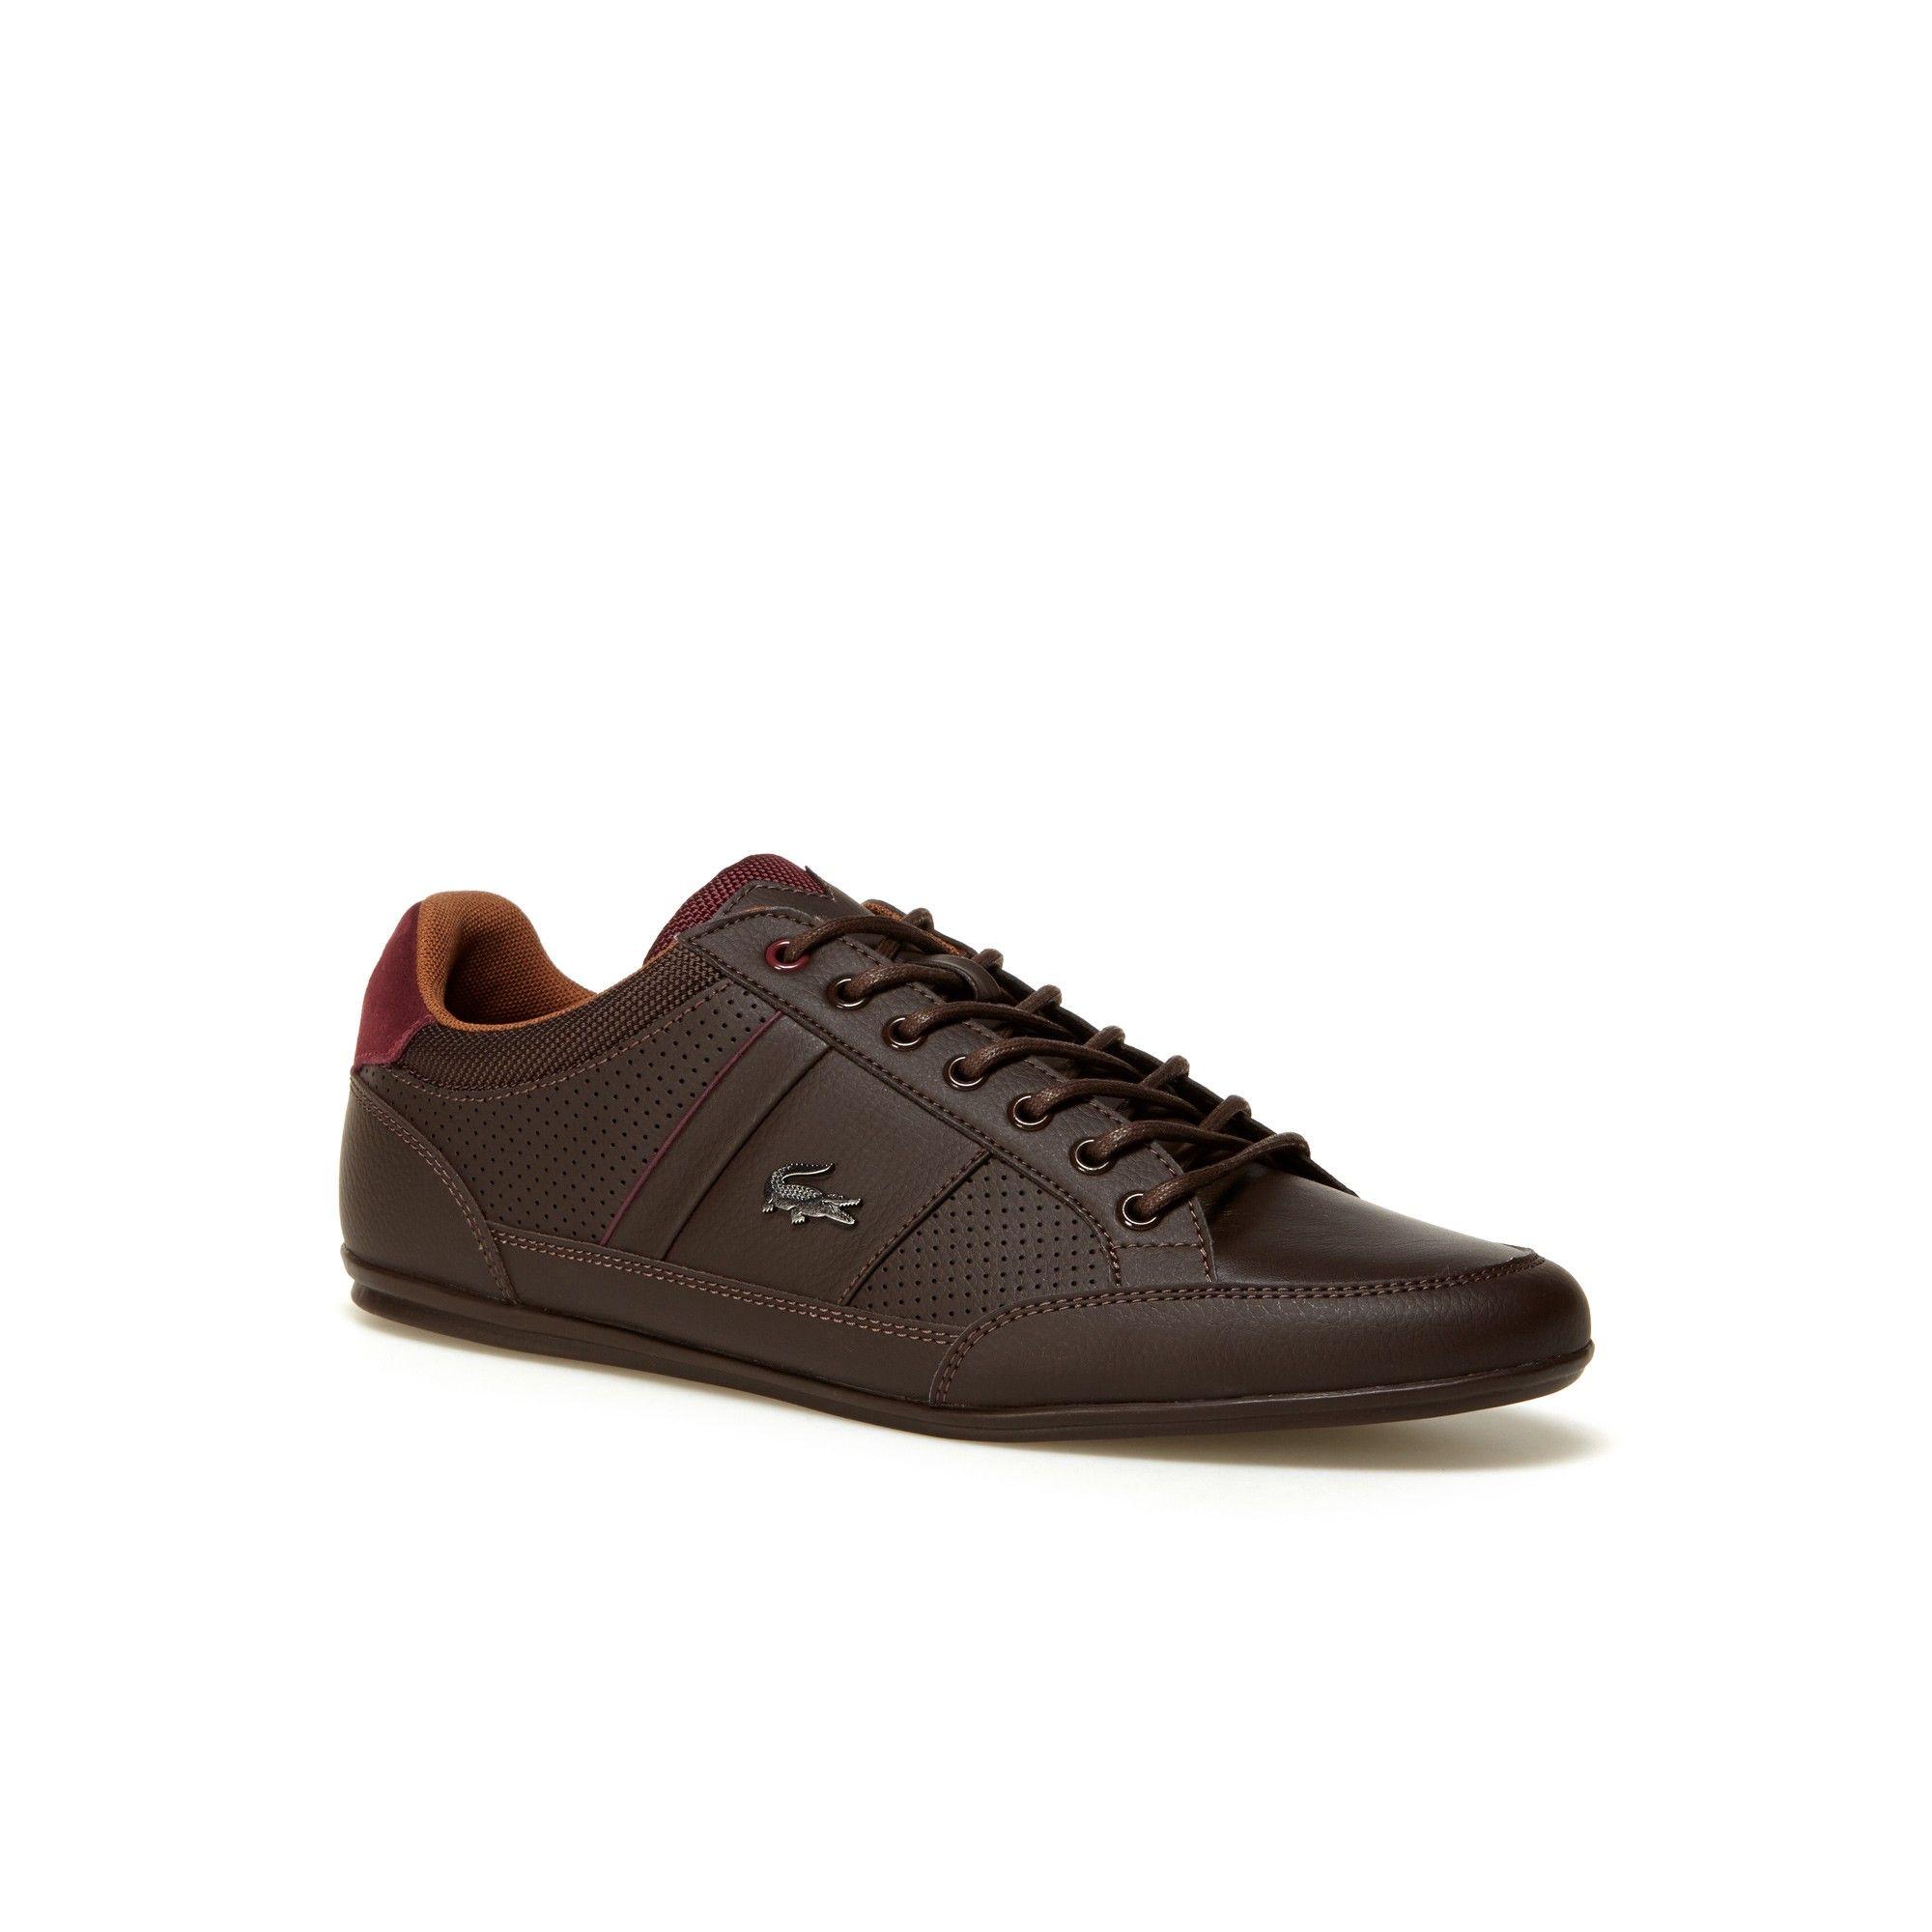 913153c826faef LACOSTE Men s Chaymon Leather Sneakers - dark brown tan.  lacoste  shoes